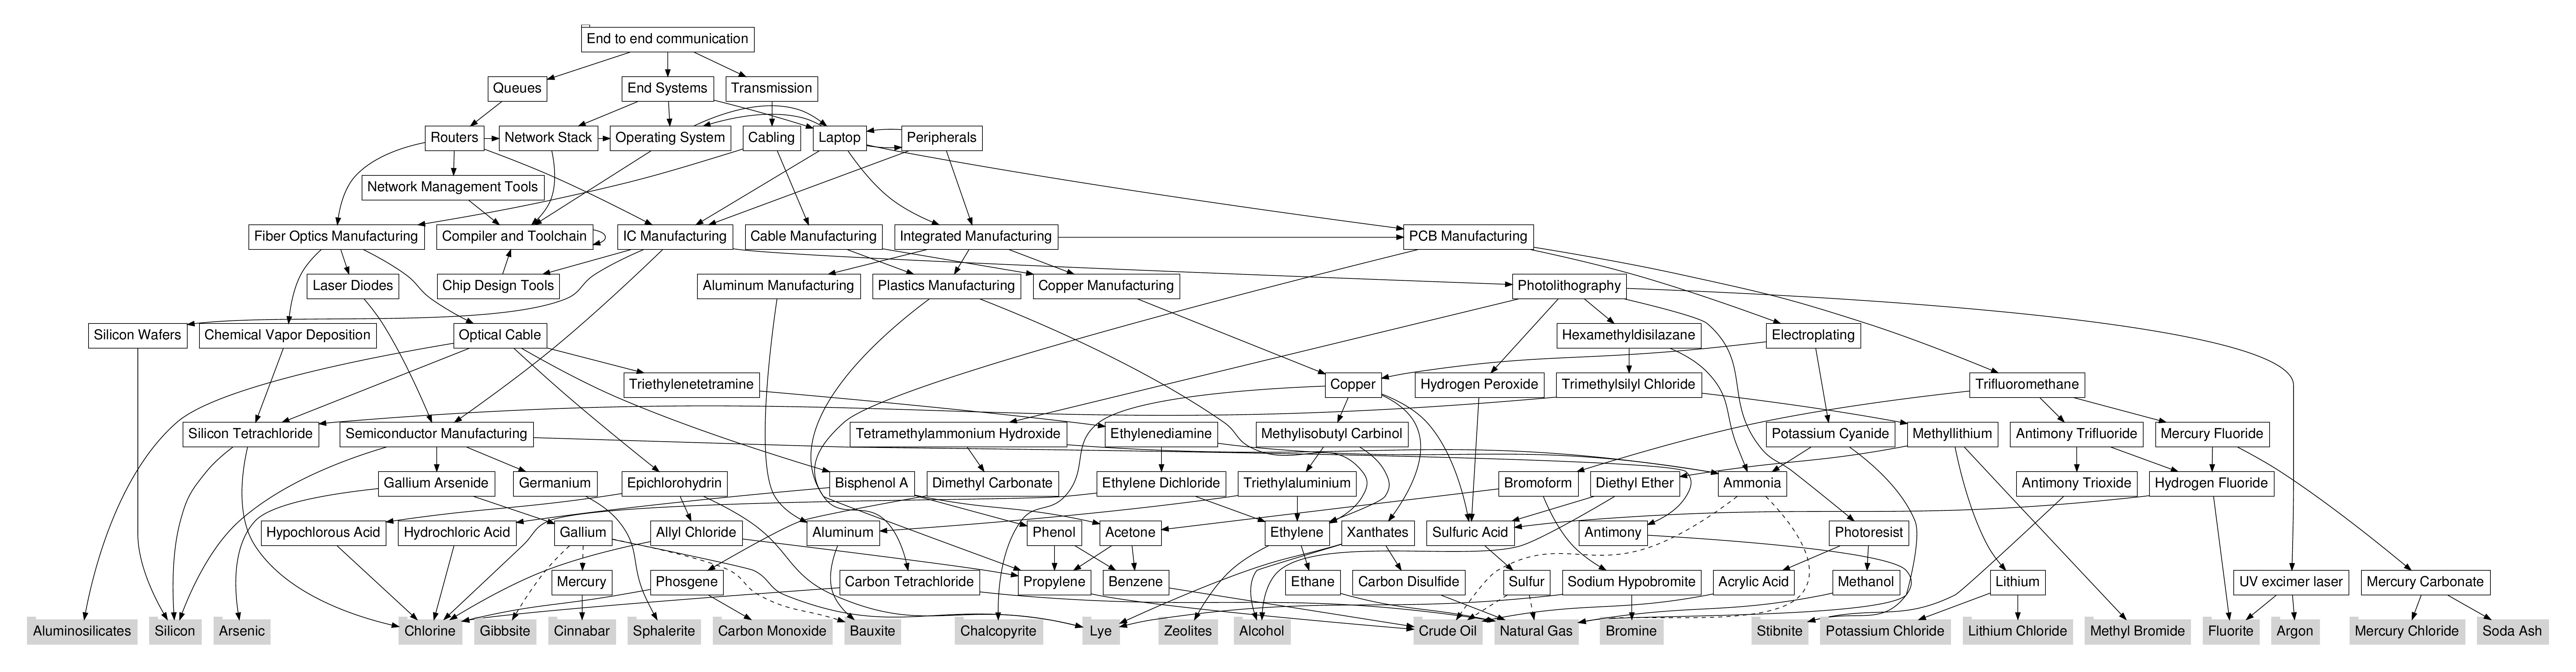 internet dependencies